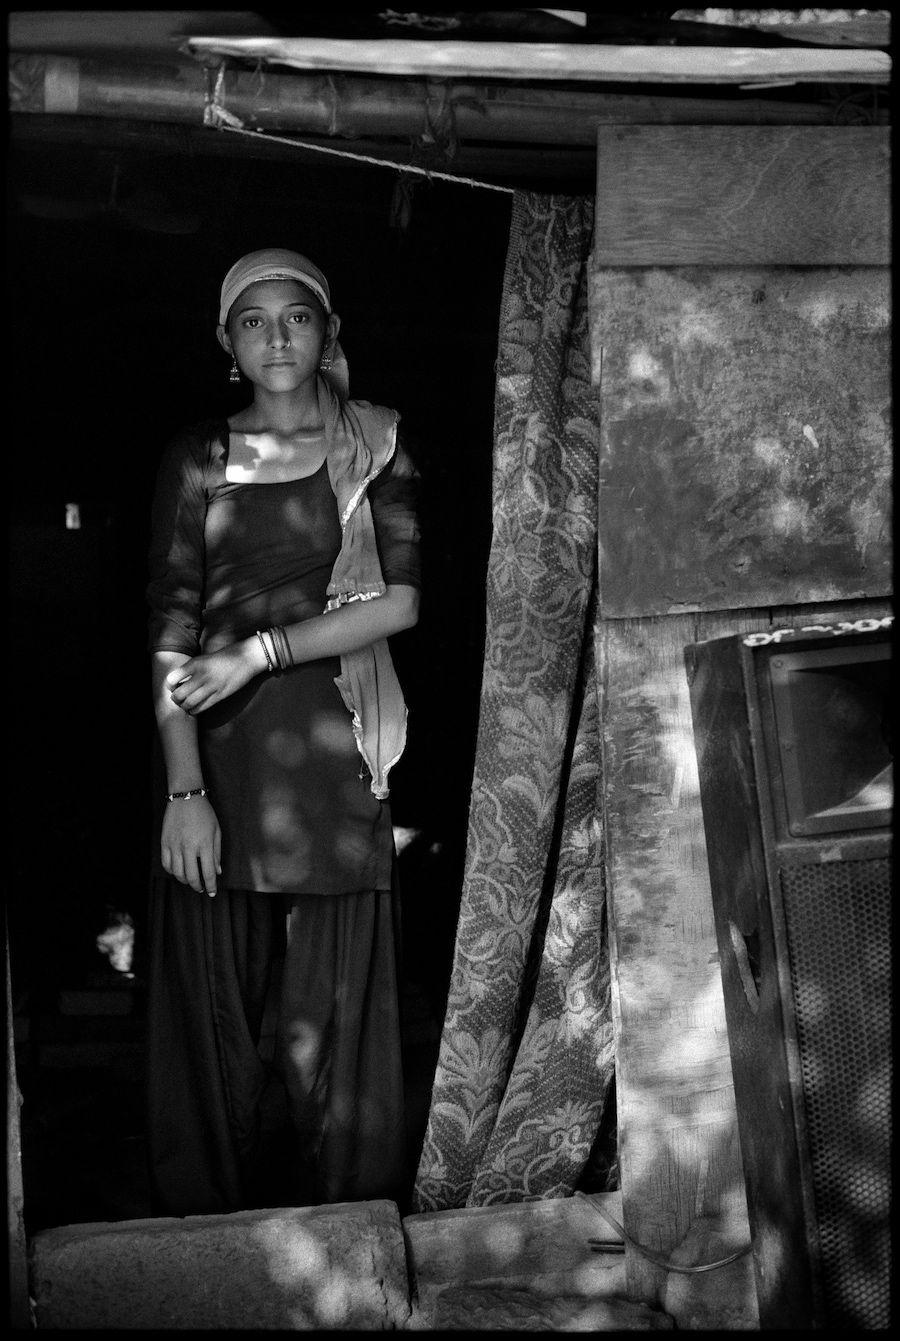 Untitled, Delhi, India 2014